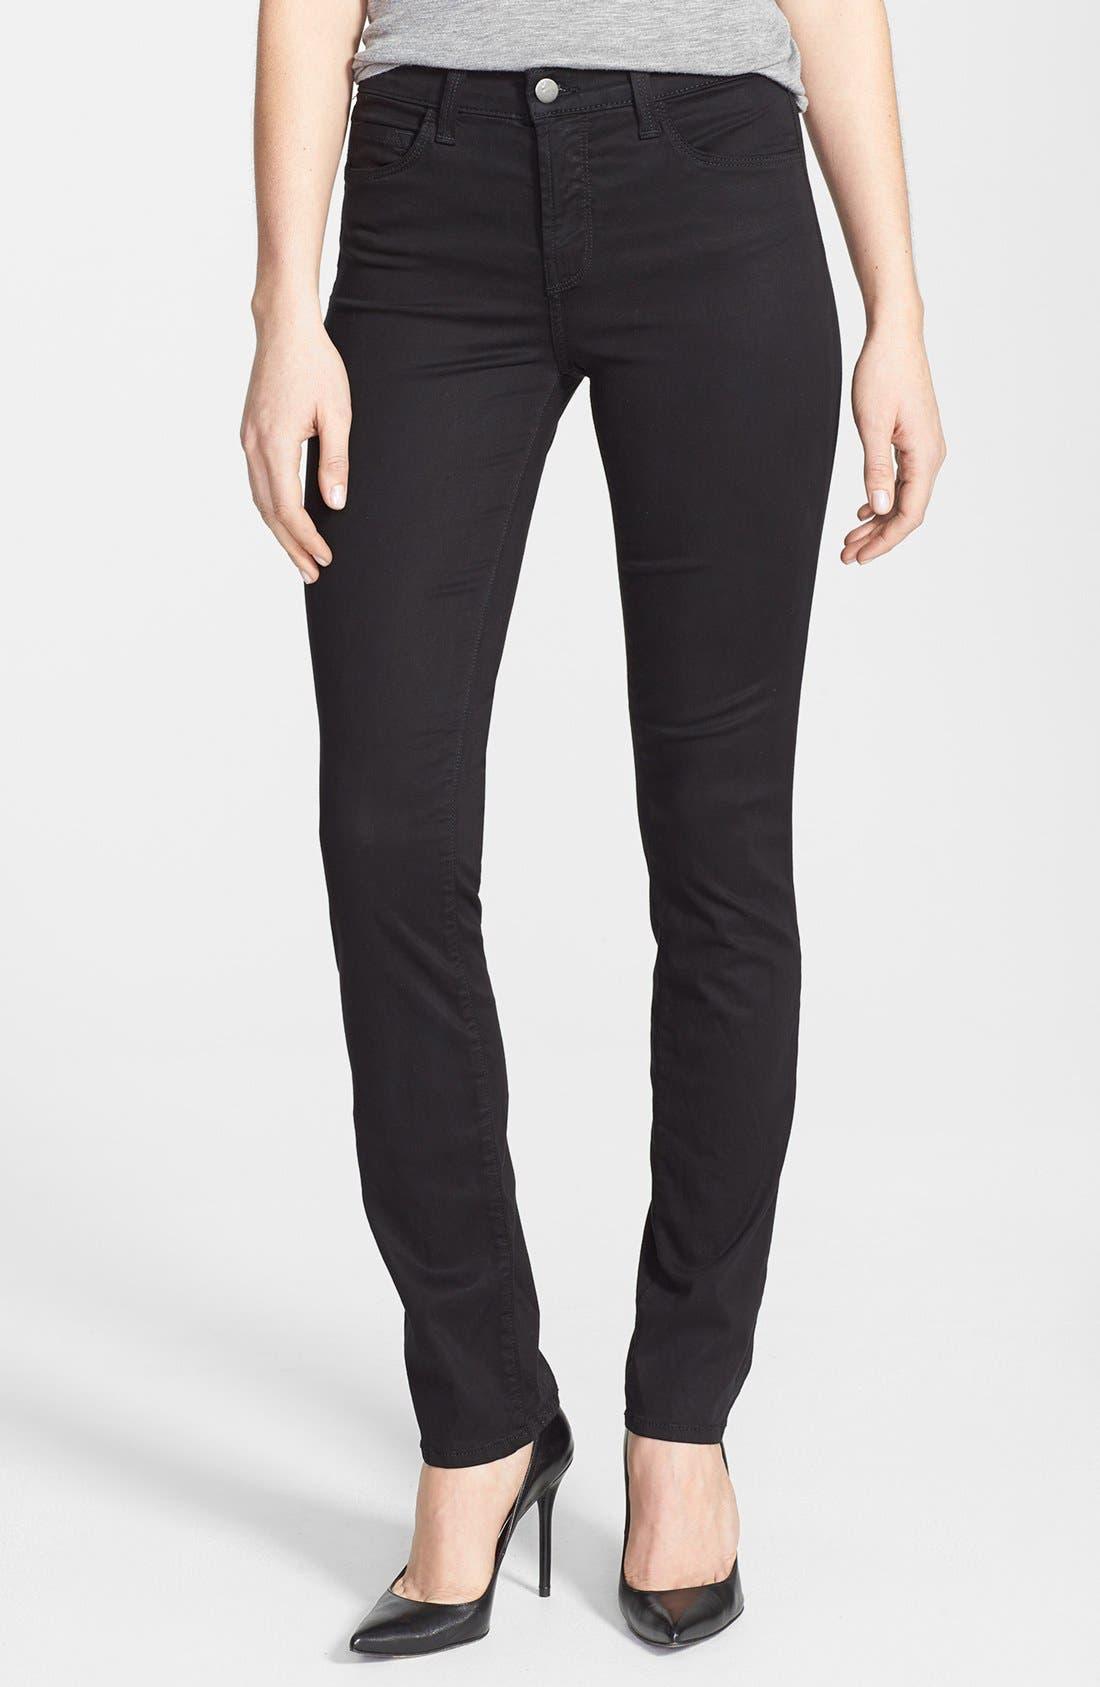 Alternate Image 1 Selected - J Brand 'Rails' Straight Leg Jeans (Black Luxe Sateen)